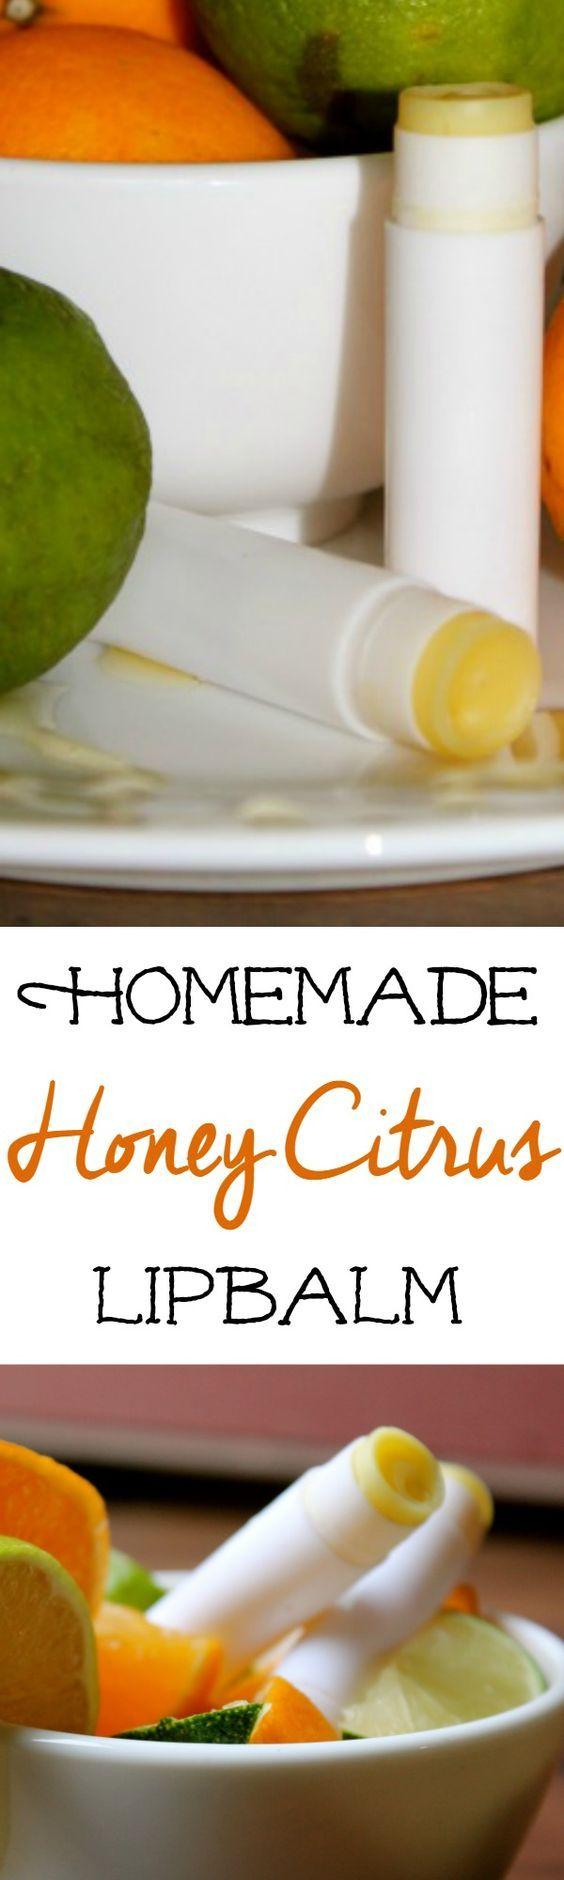 DIY Honey Citrus Lipbalm :: This DIY lipbalm recipe is a fun gift idea!